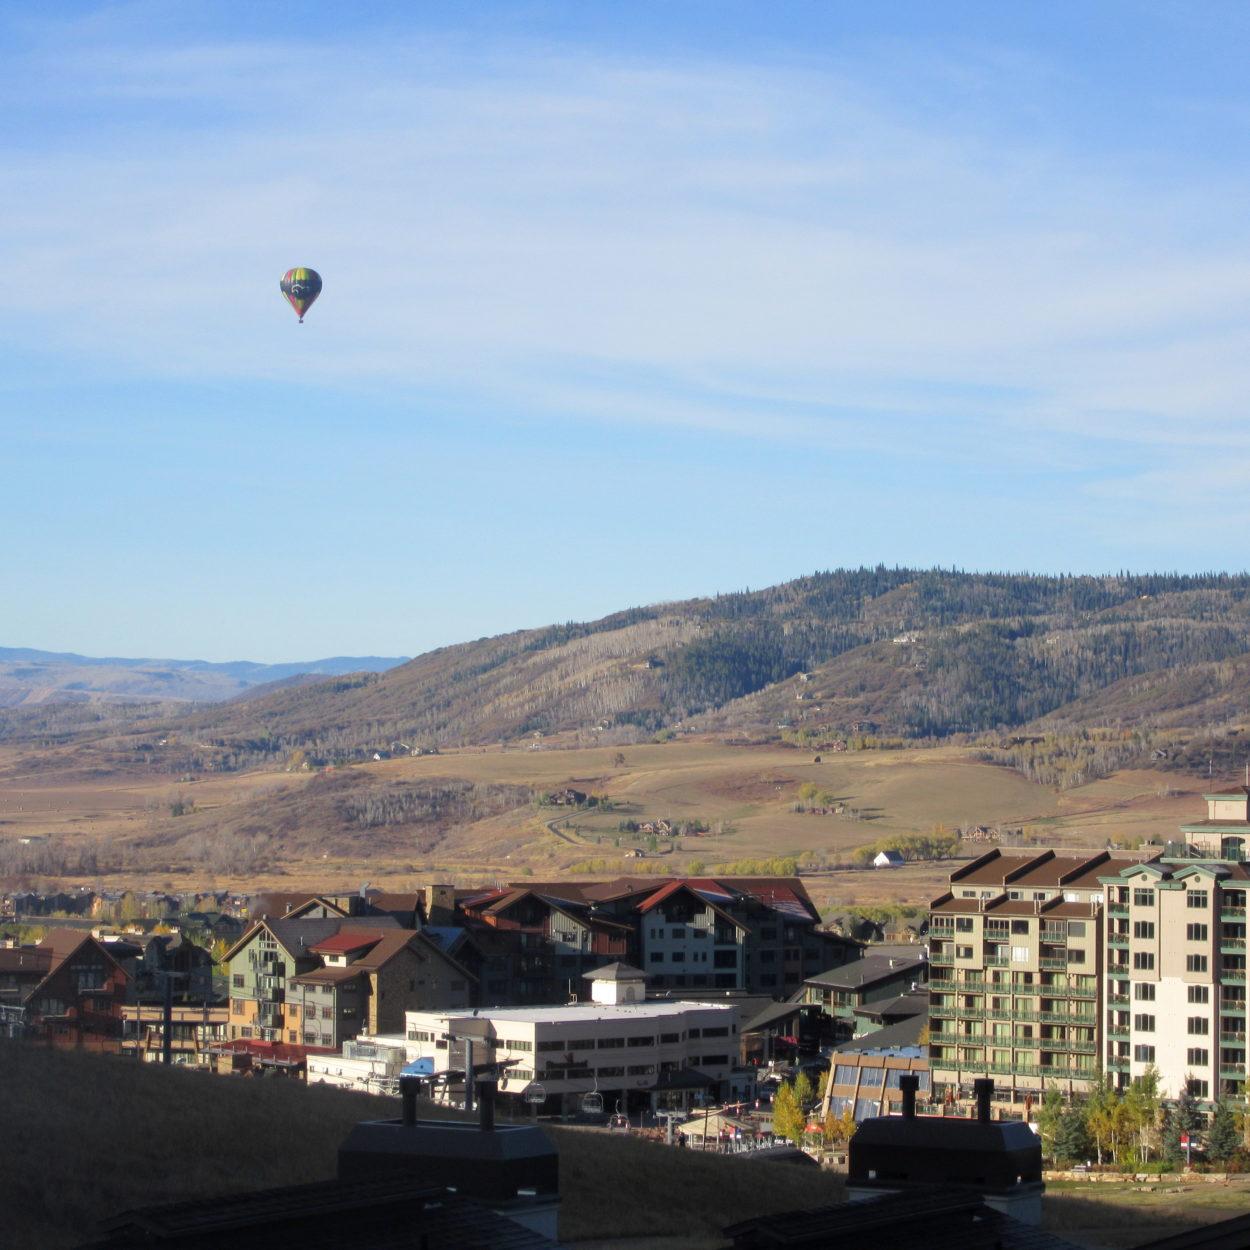 Balloon over Steamboat